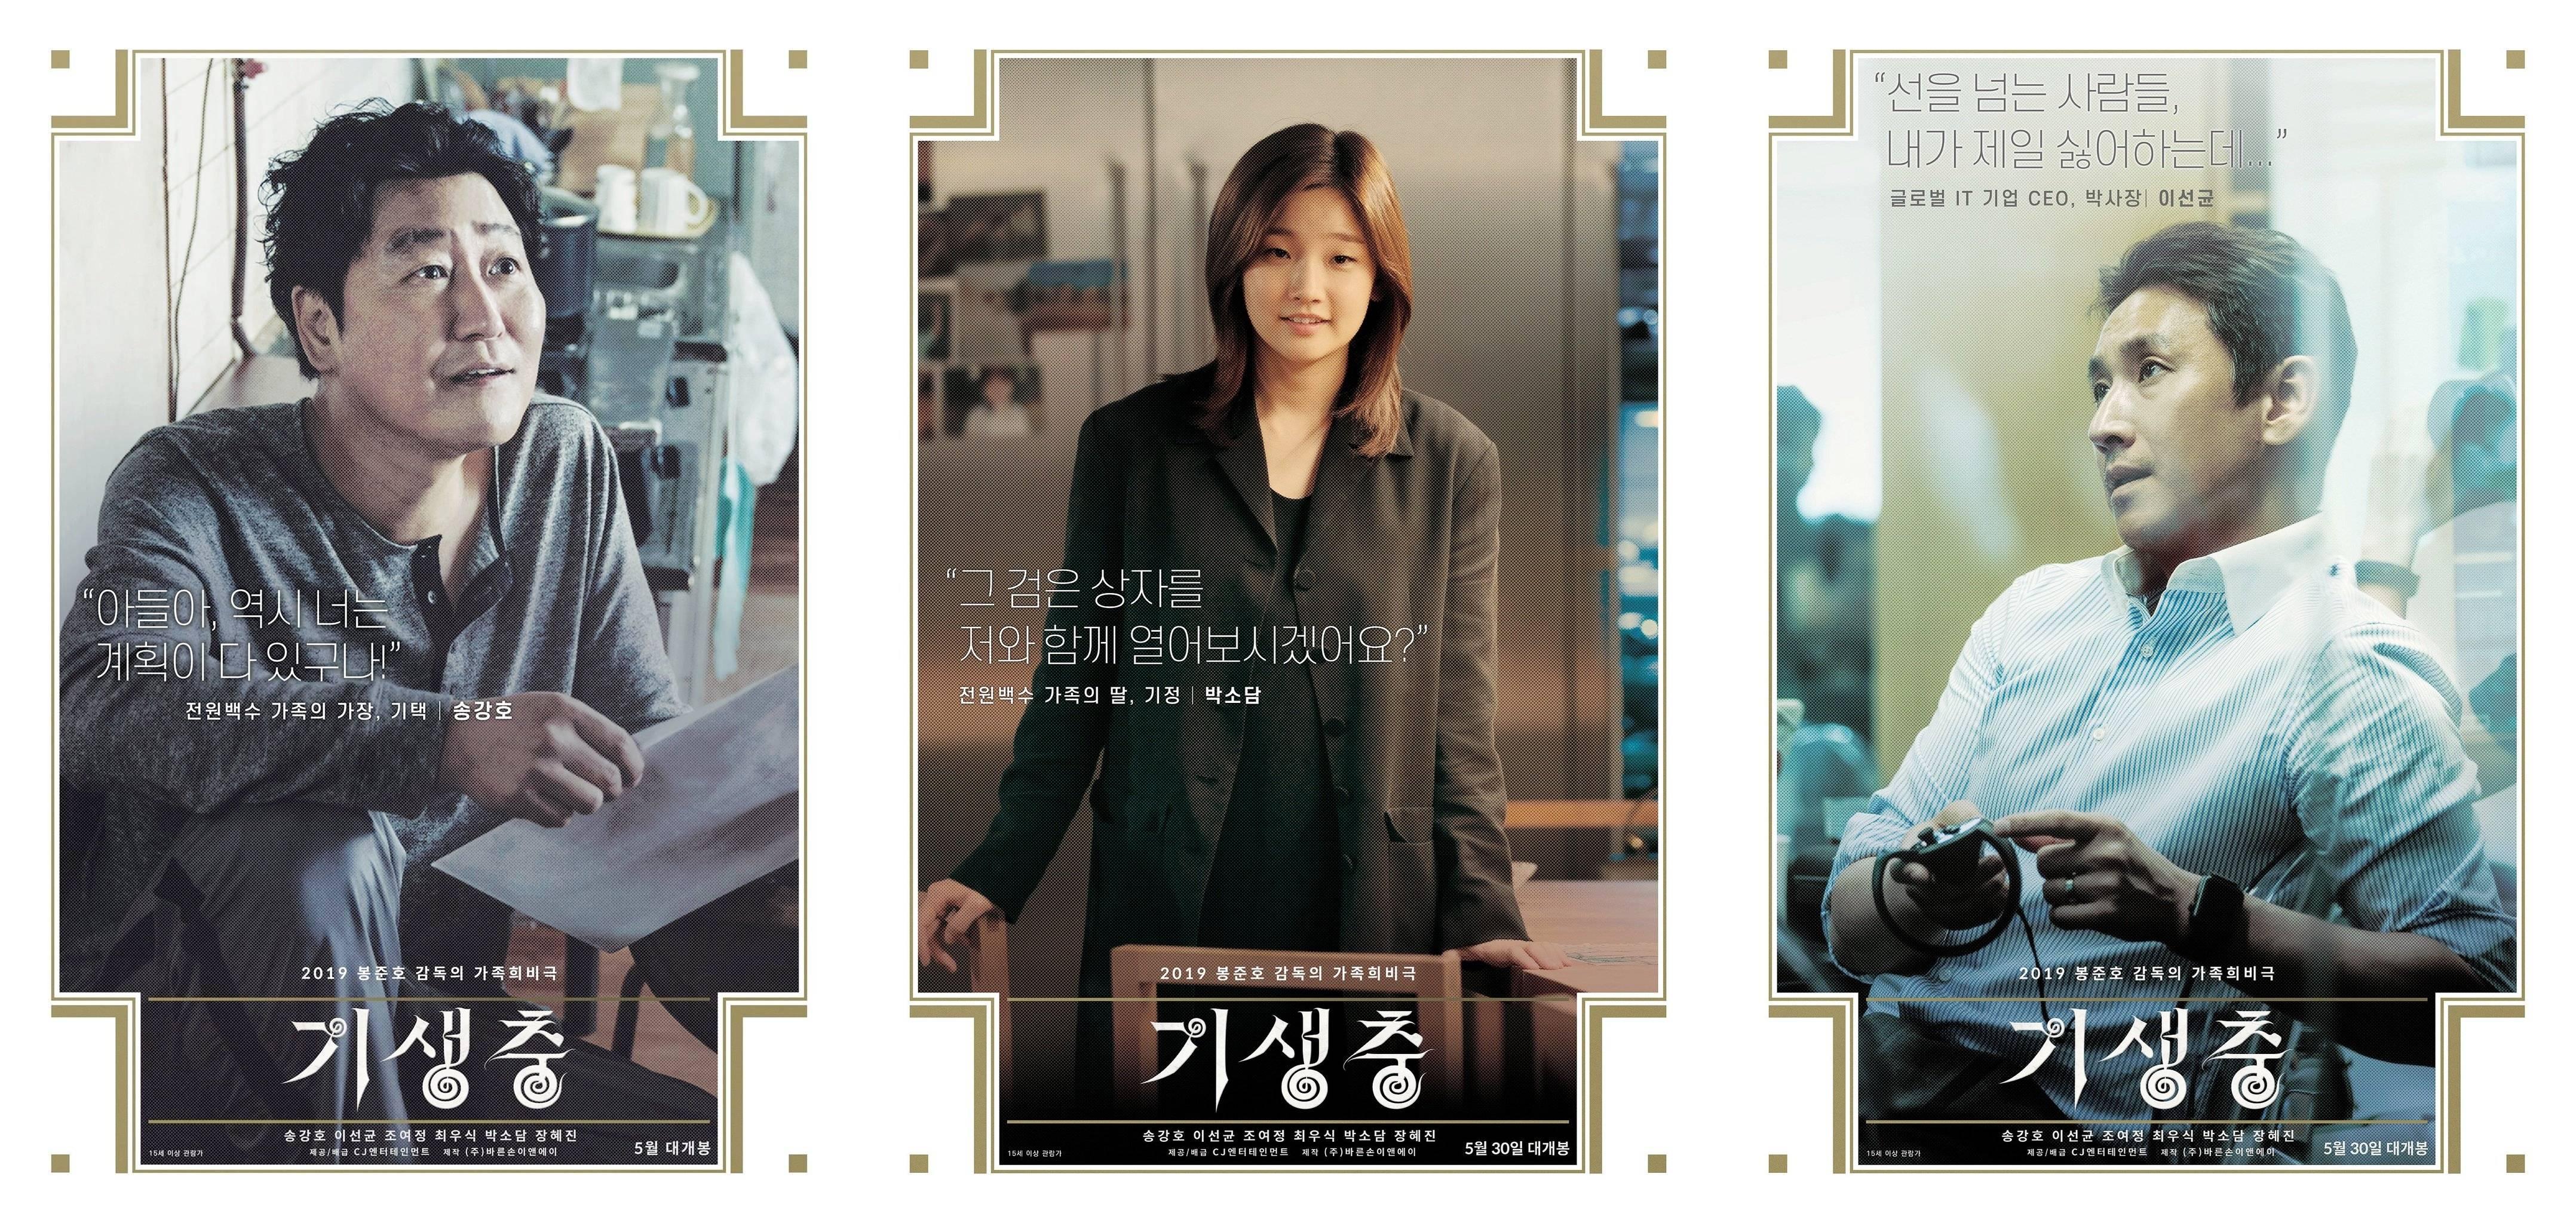 HanCinema's News] The Cast of